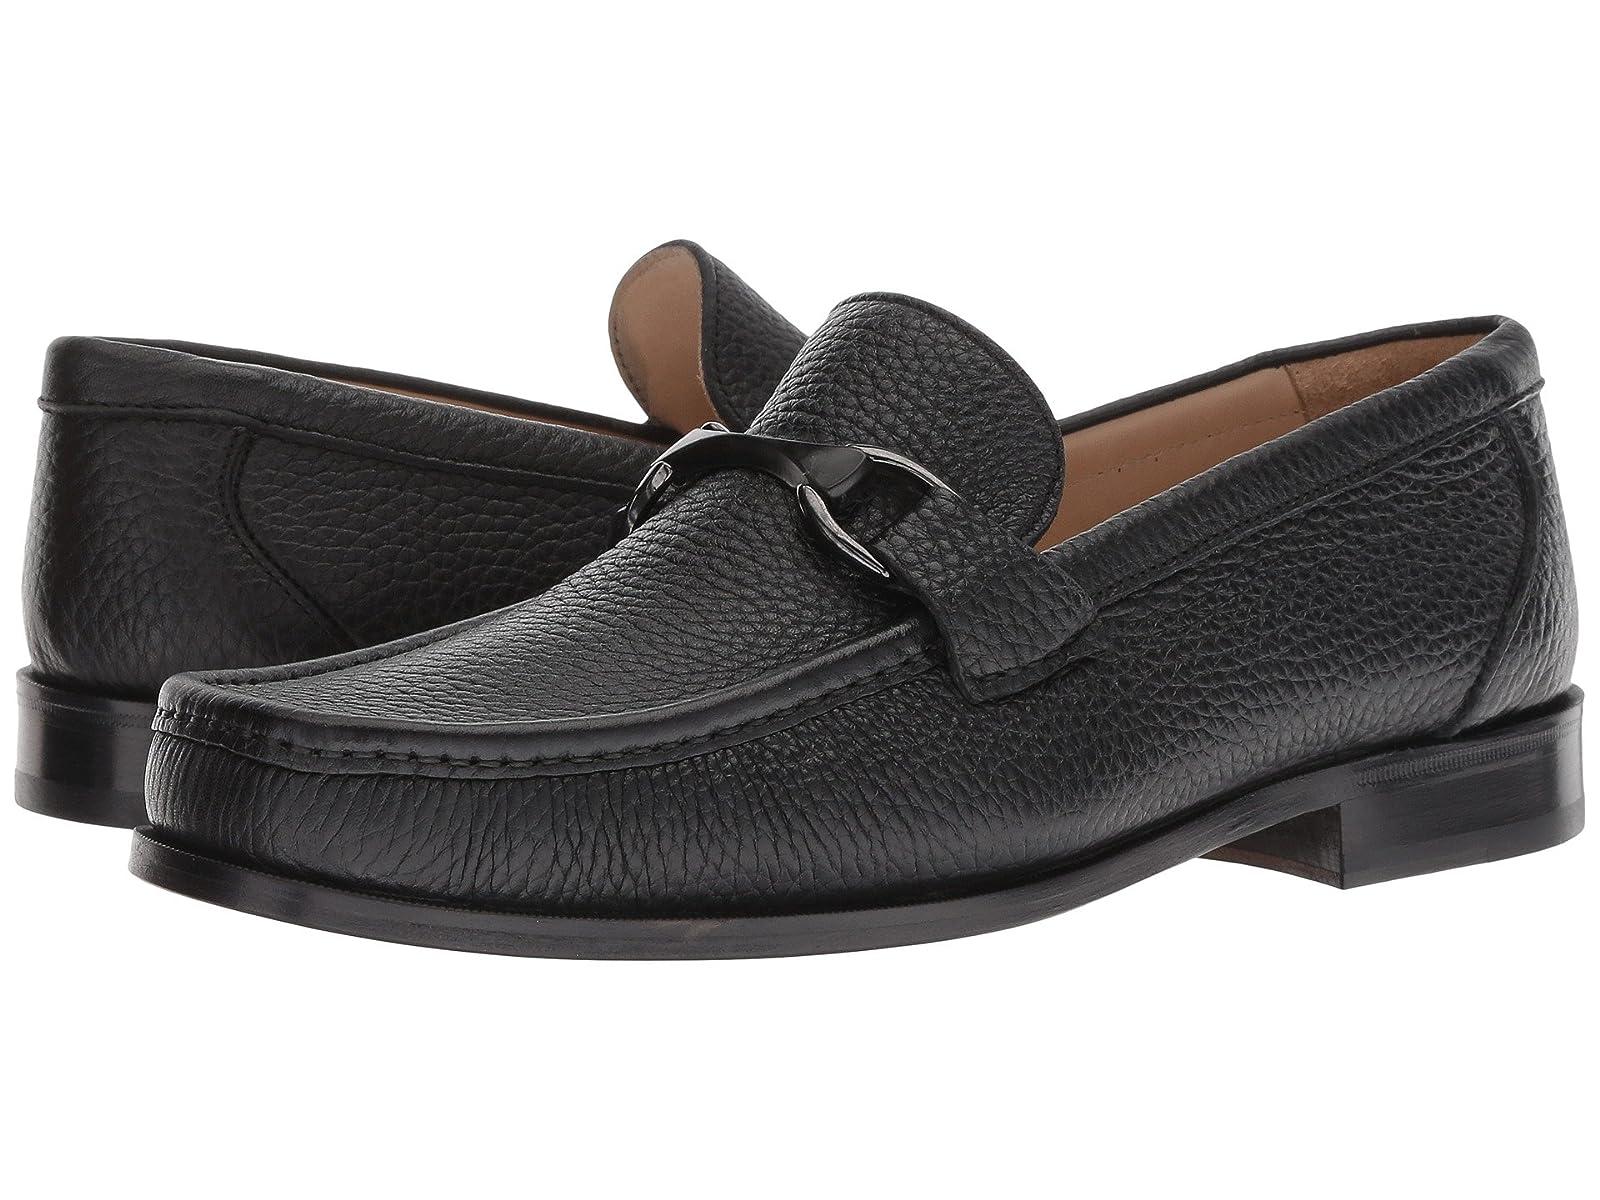 BUGATCHI Padua LoaferAtmospheric grades have affordable shoes